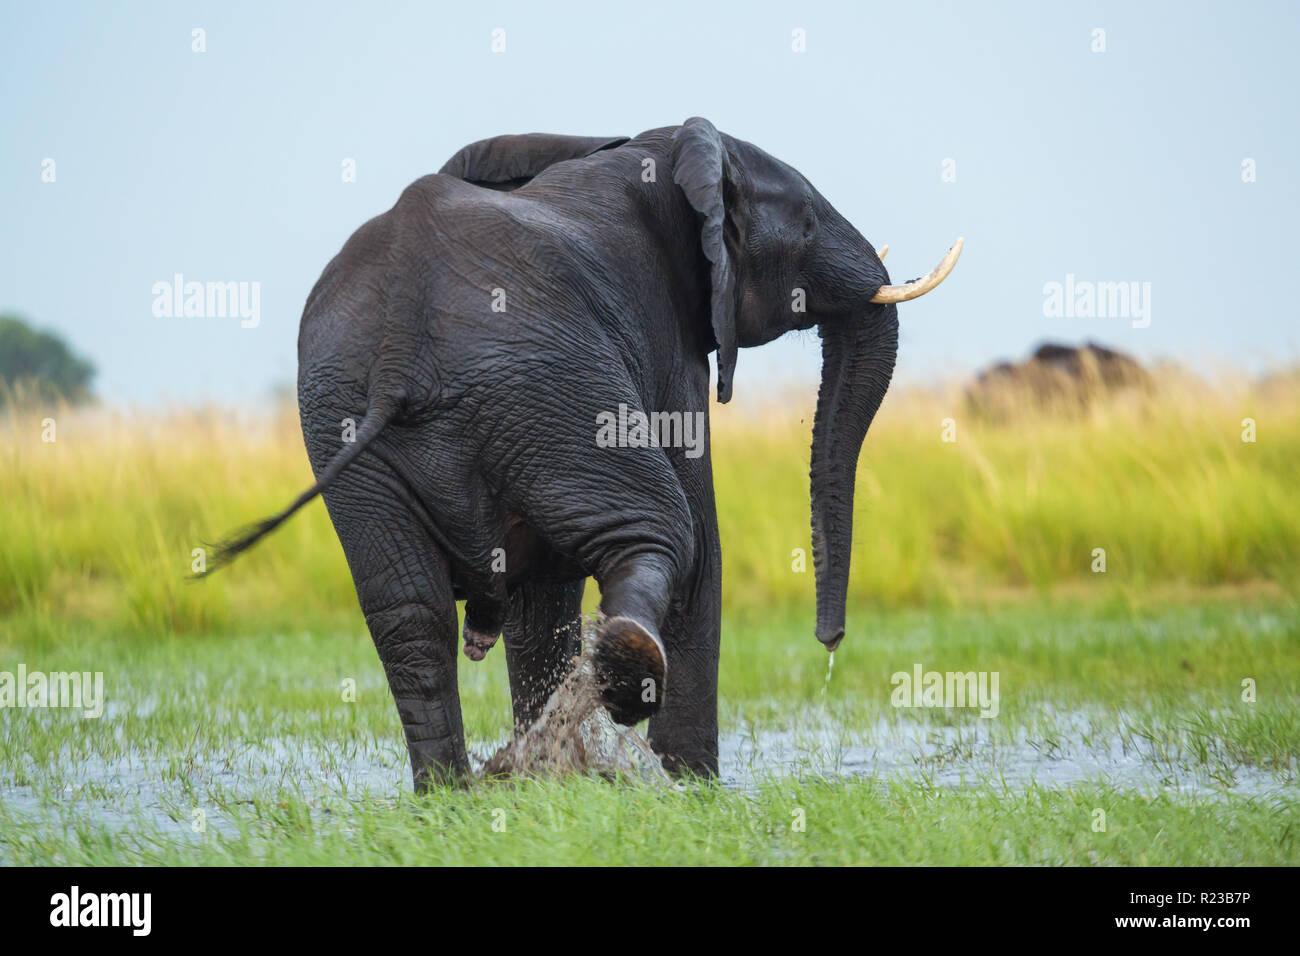 Elephant in Chobe National Park, Botswana, Africa Stock Photo